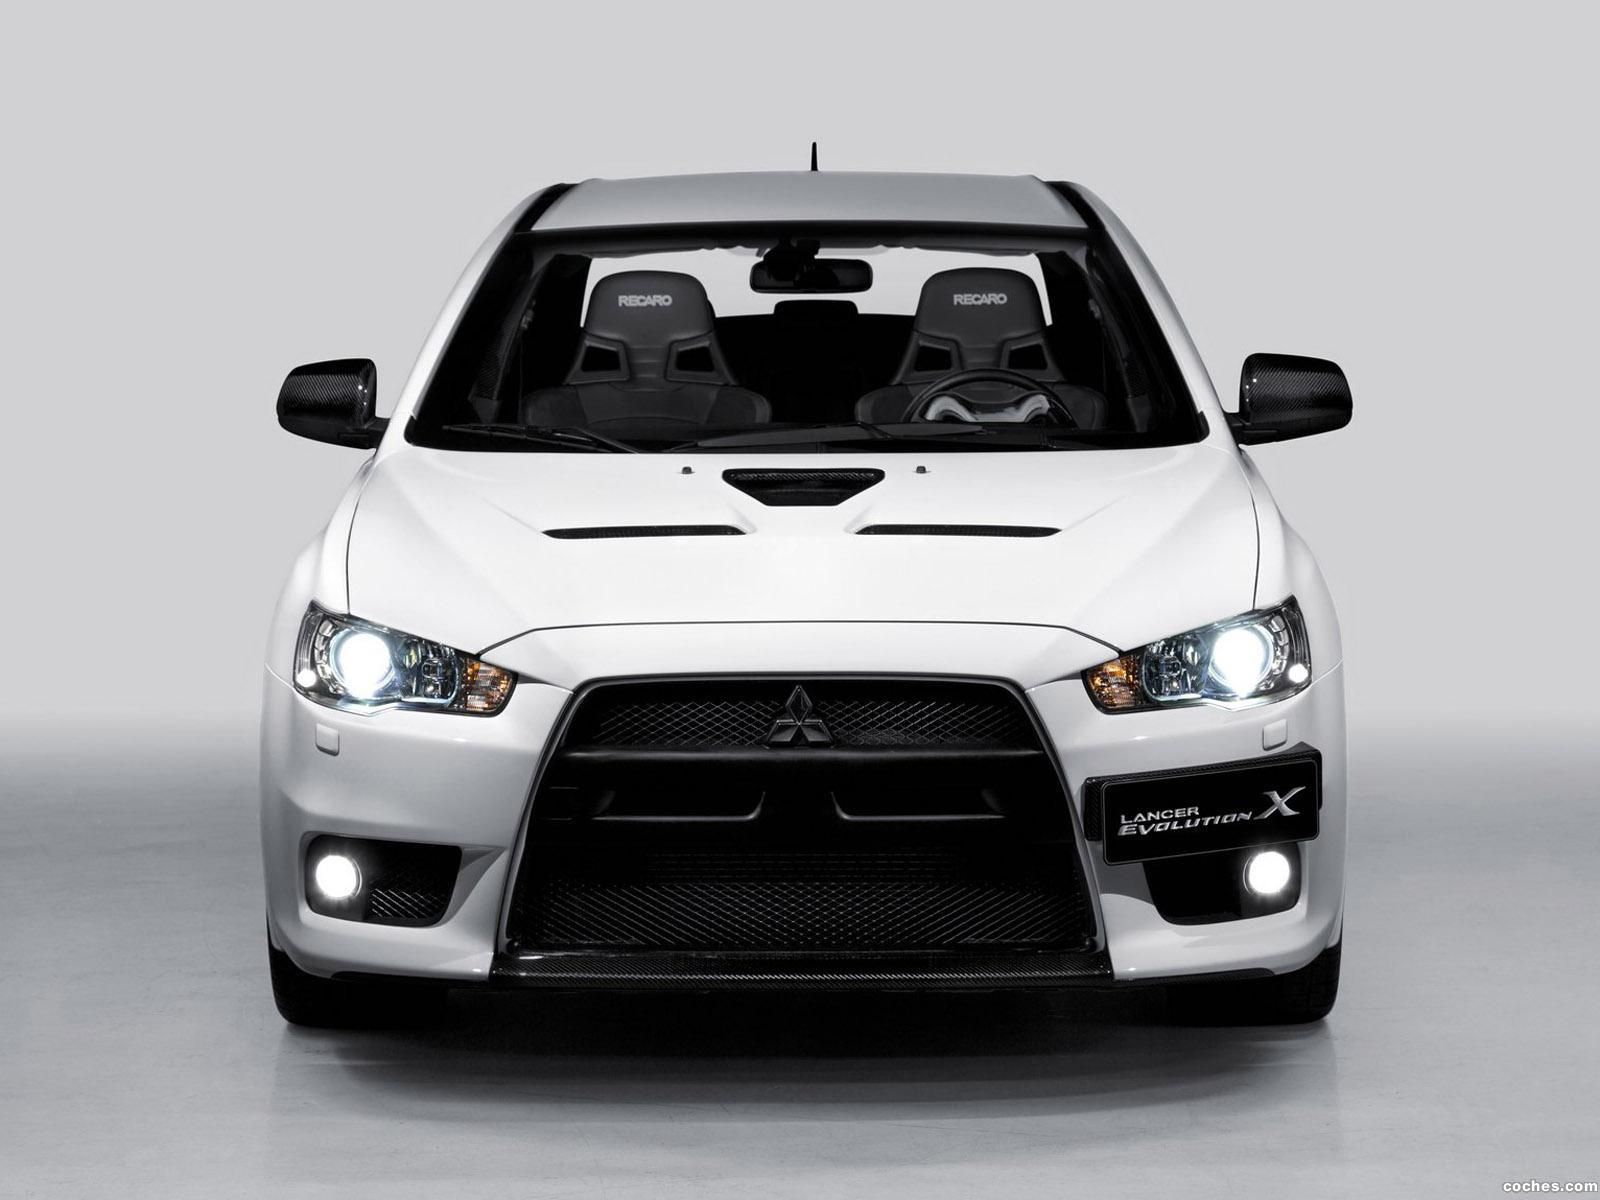 Foto 4 de Mitsubishi Lancer Evolution X Carbon Series 2012